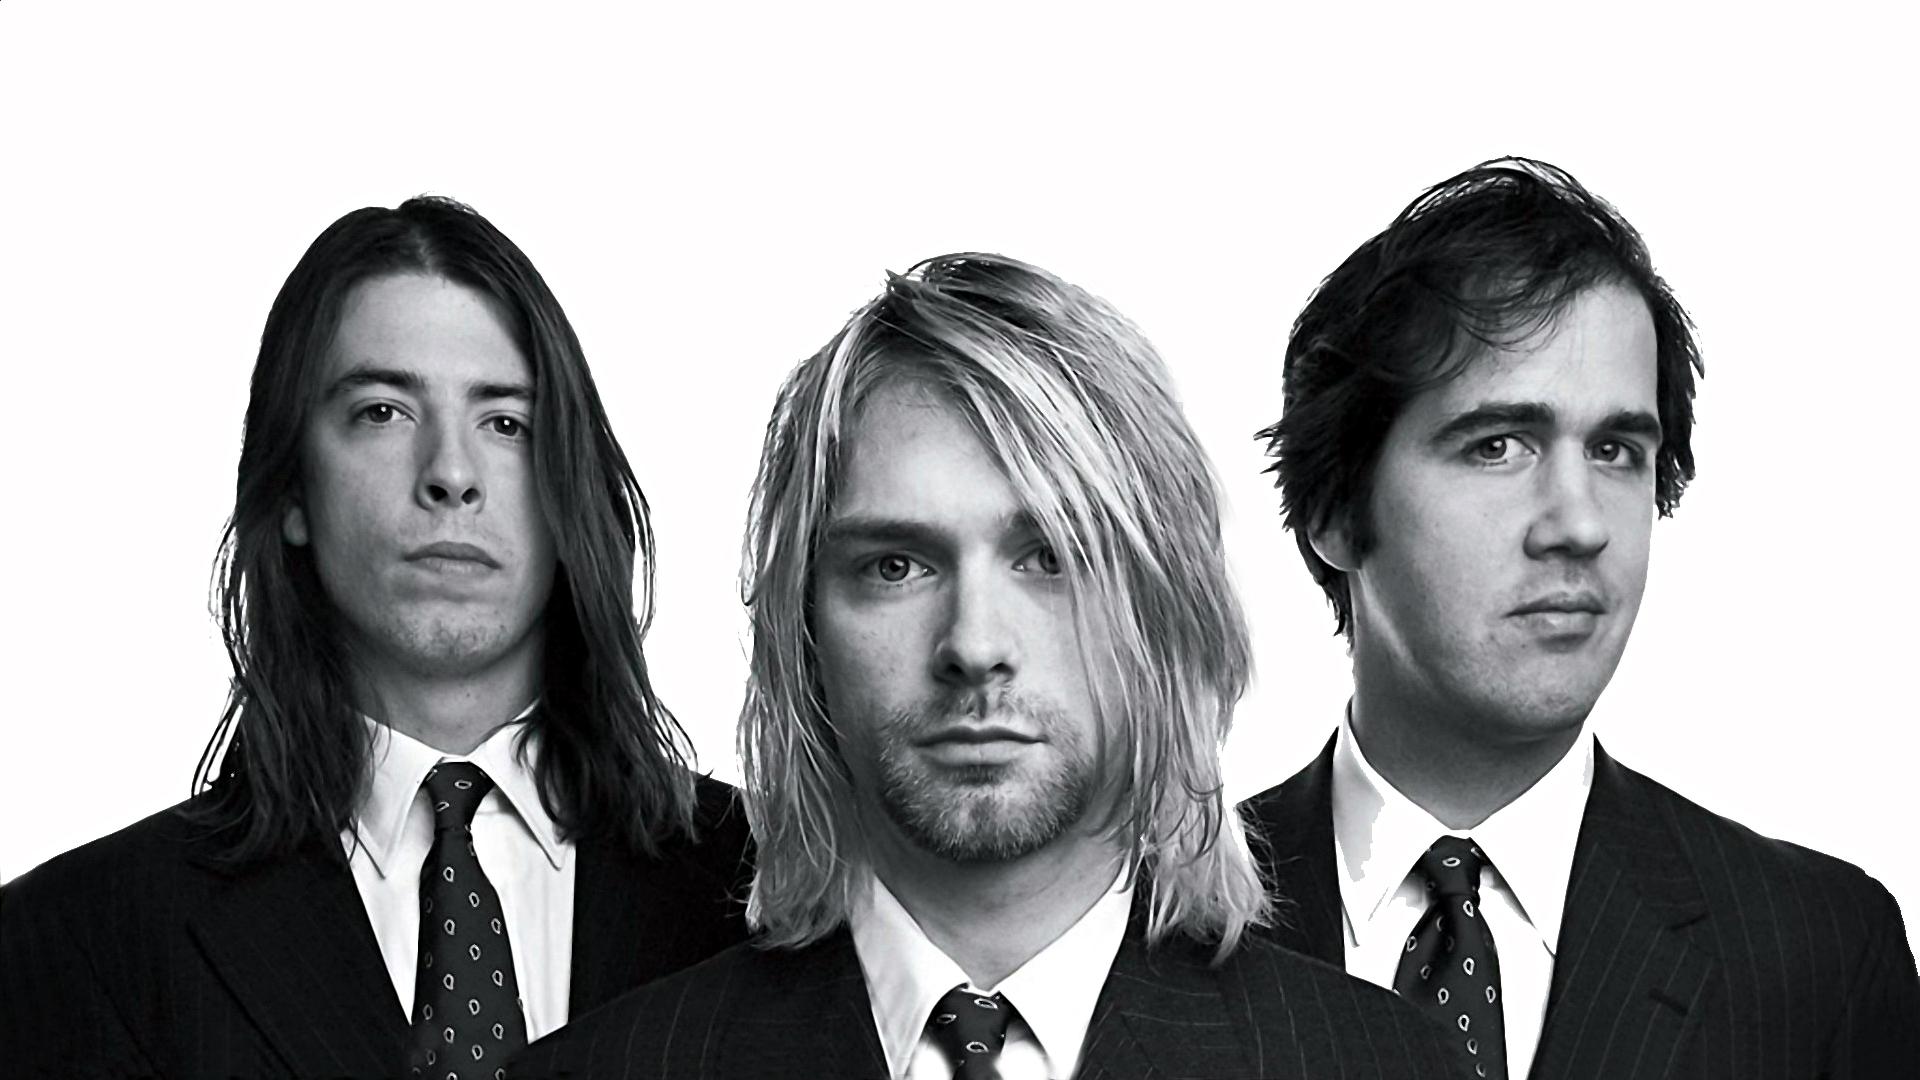 Kurt Cobain Quotes Wallpaper Free Desktop Nirvana Wallpapers Pixelstalk Net